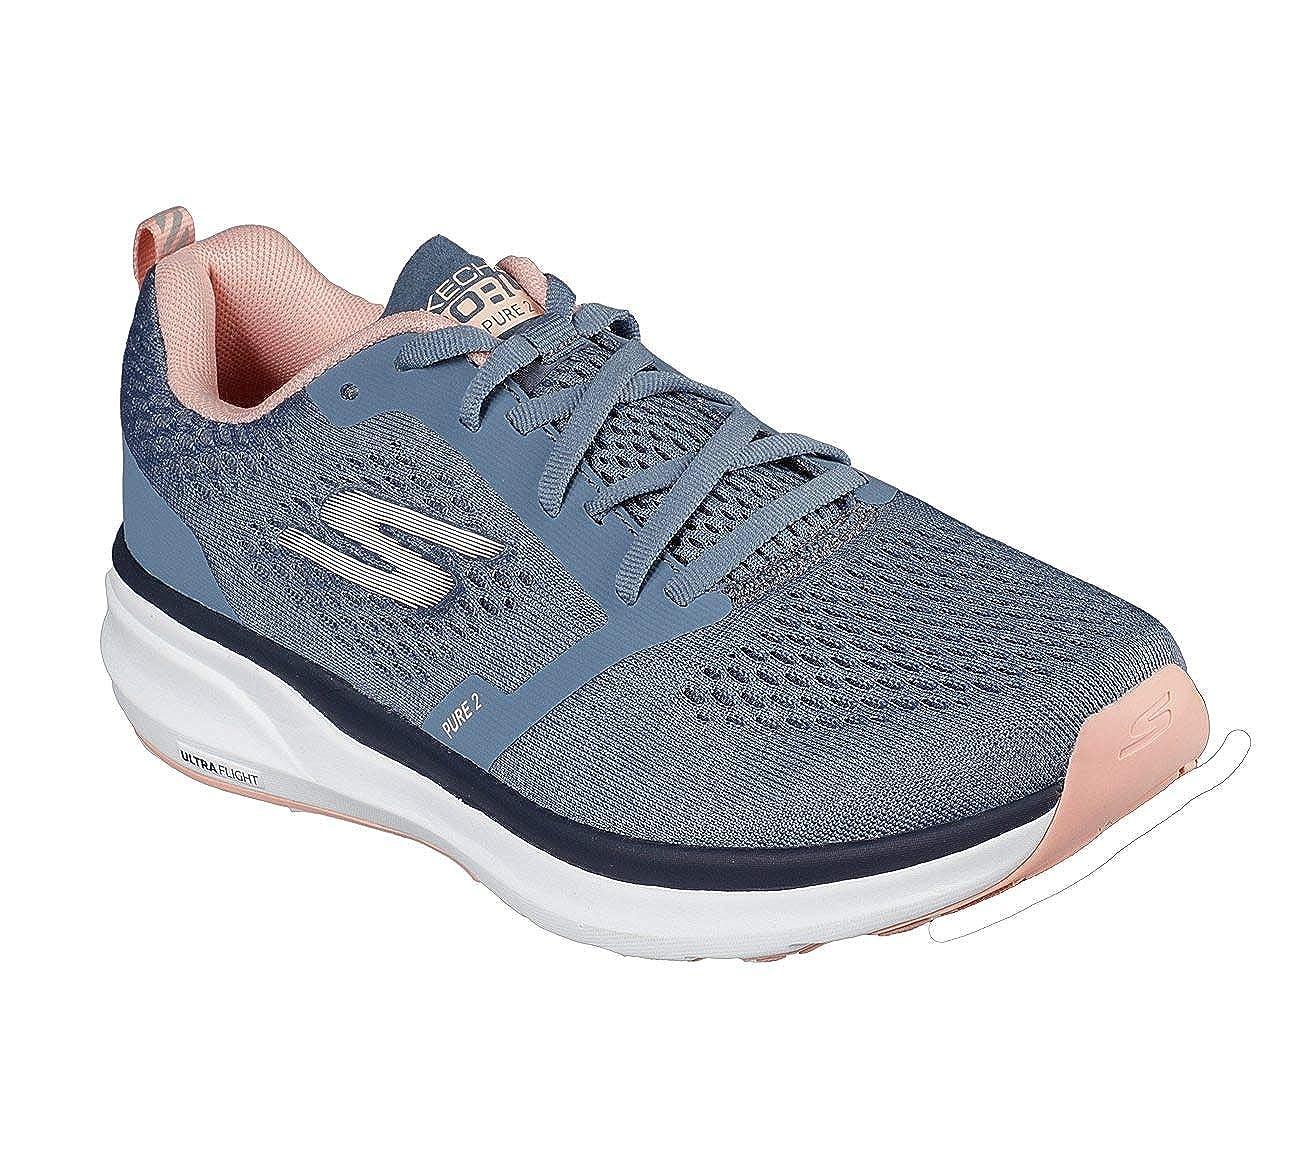 Buy Skechers Women's Go Run Pure 2 Shoe